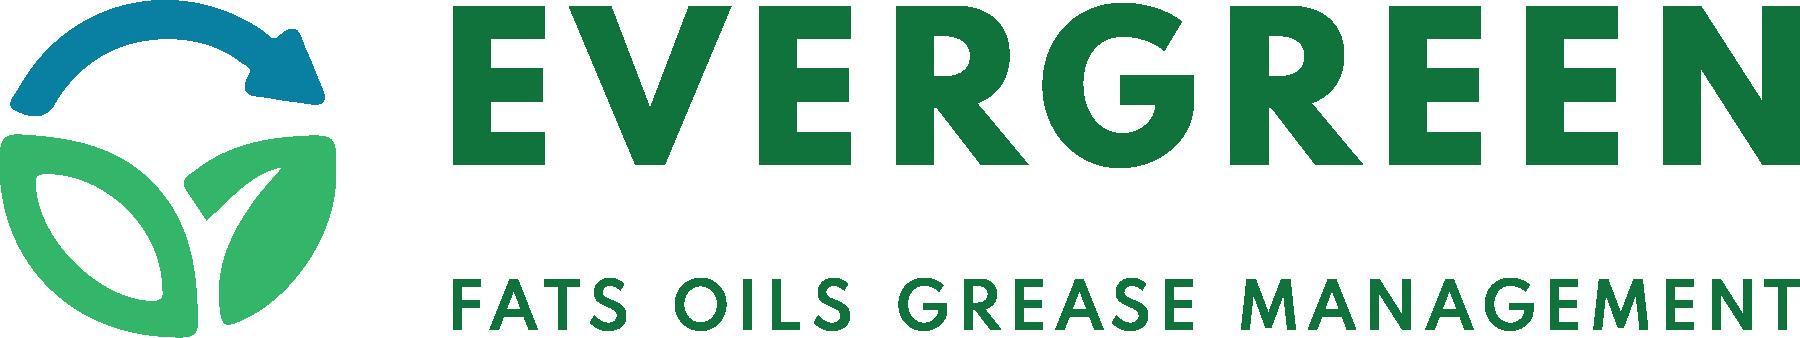 Evergreen - National Fats Oils & Grease FOG Management Service